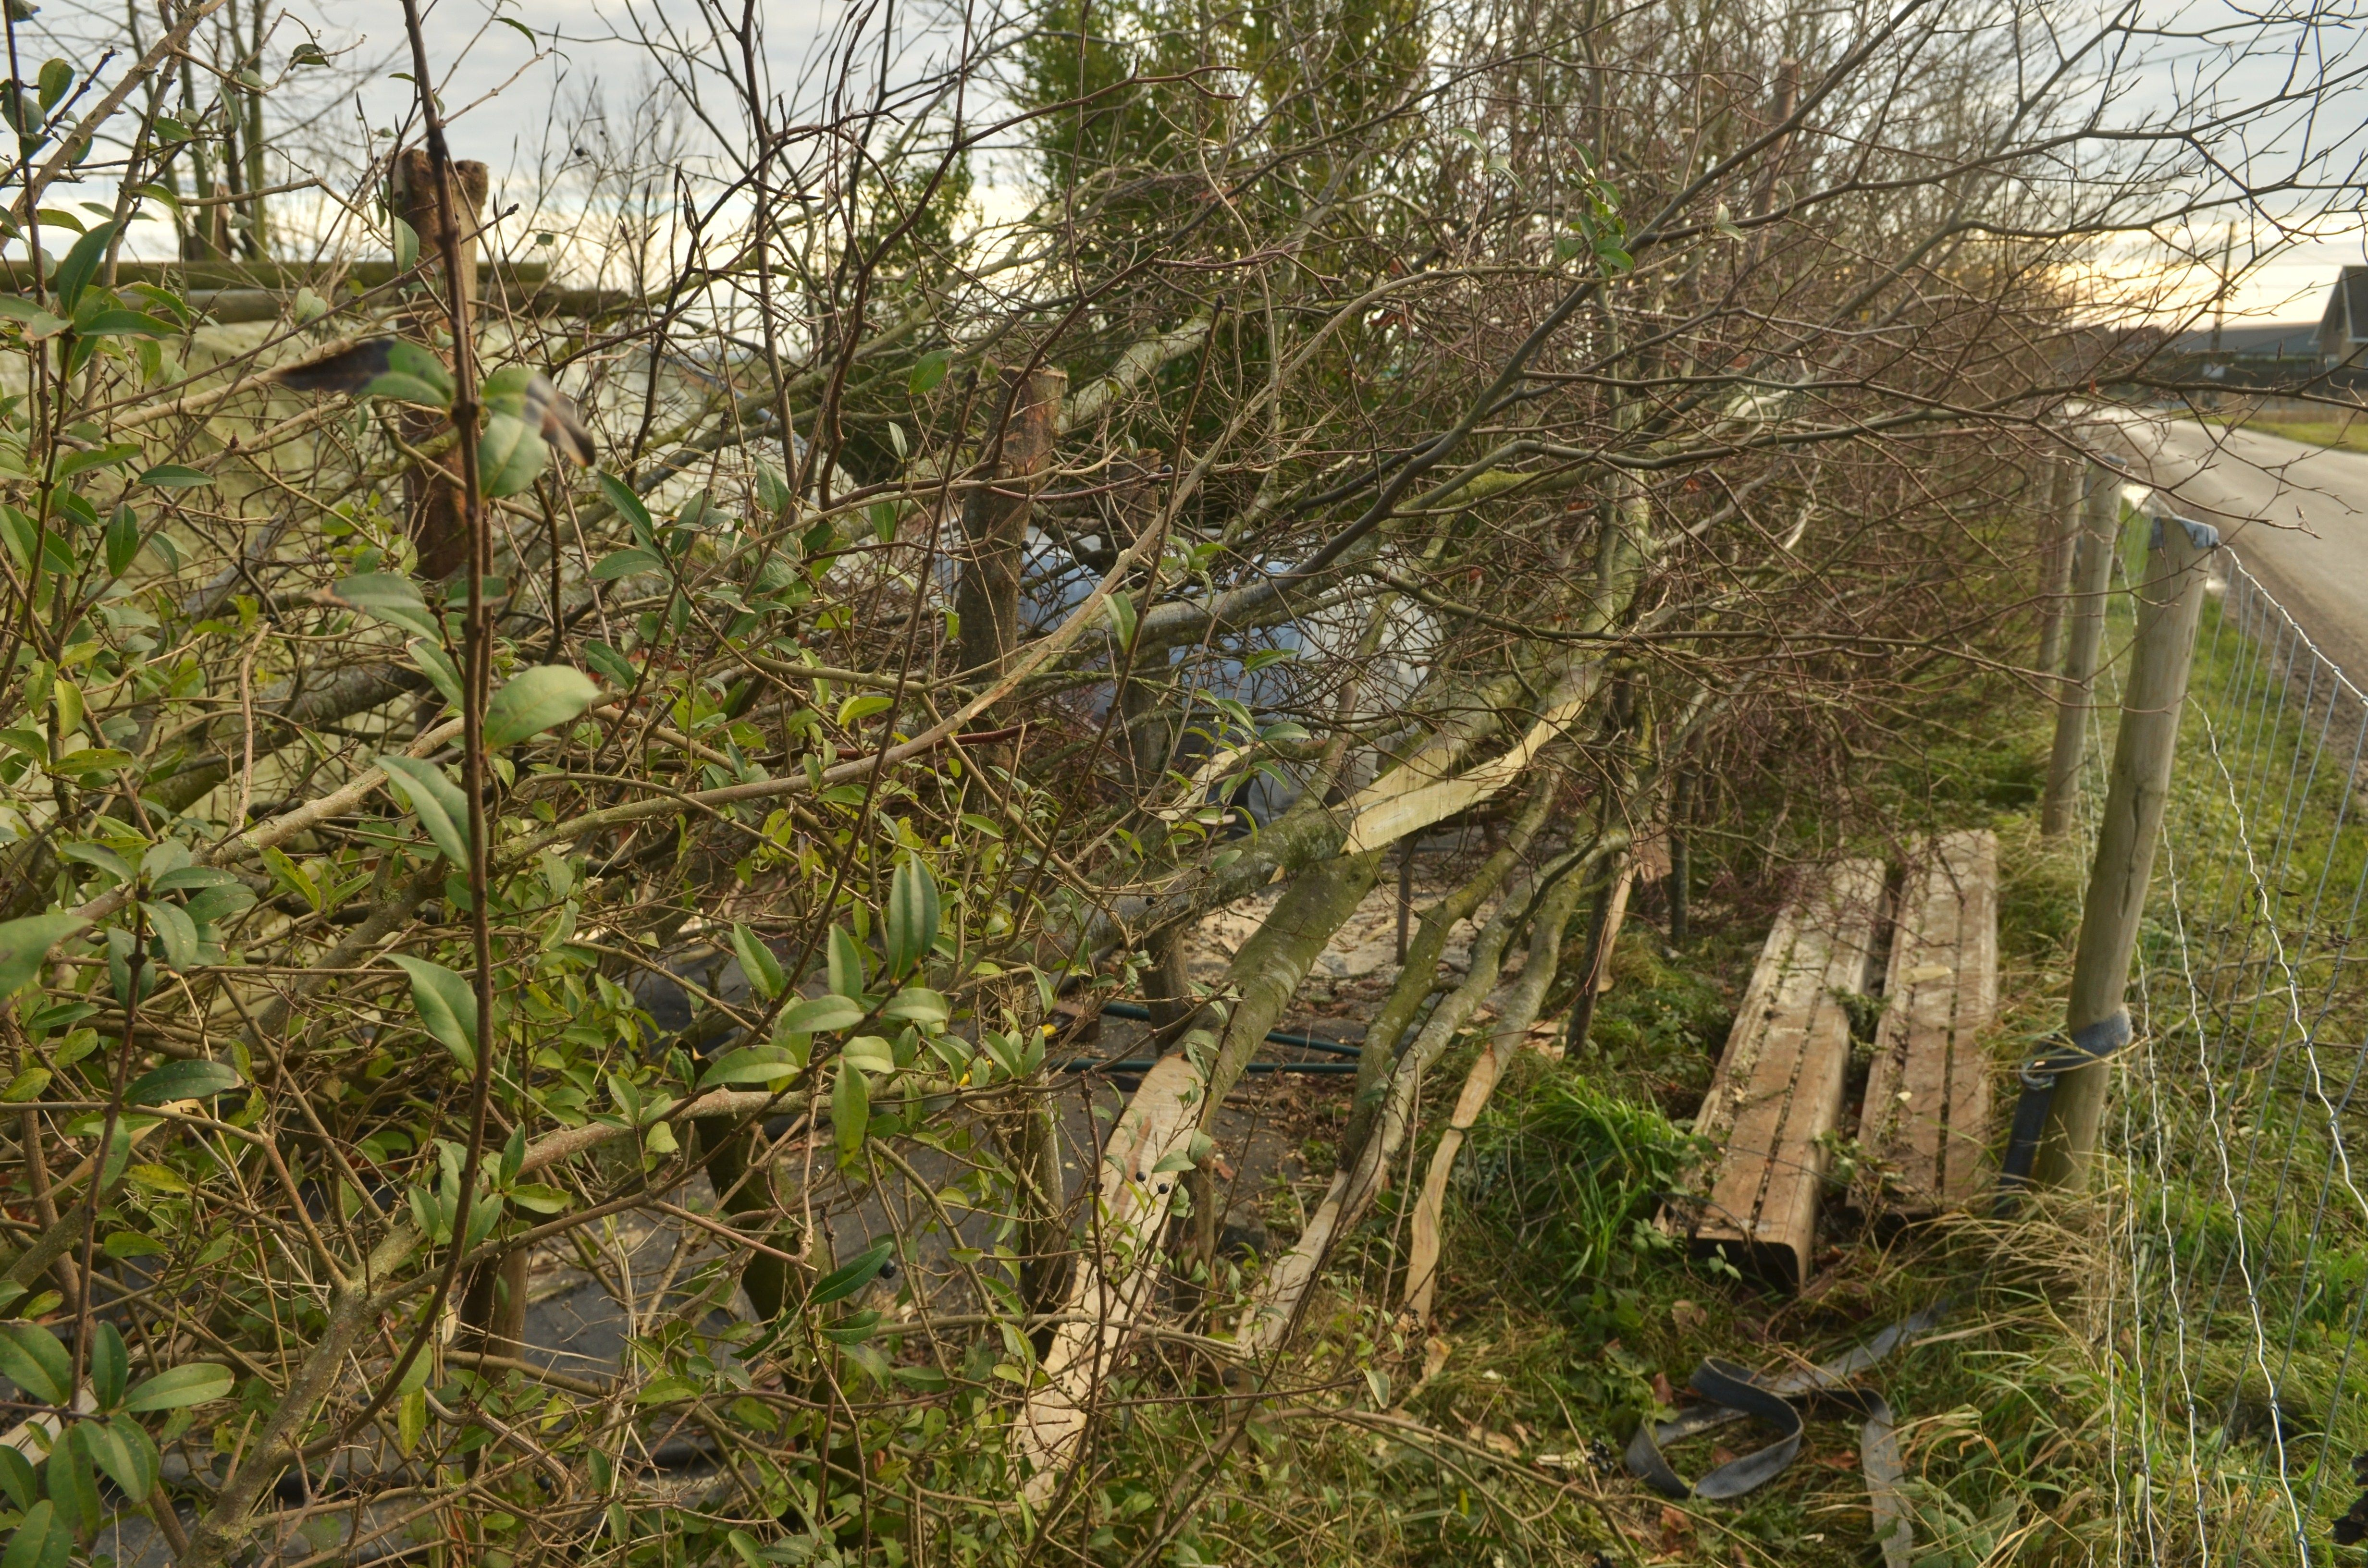 '13/12/12 Laying the hornbeam hedge in my garden @ Flanders fields, Belgium. F. Neirinck